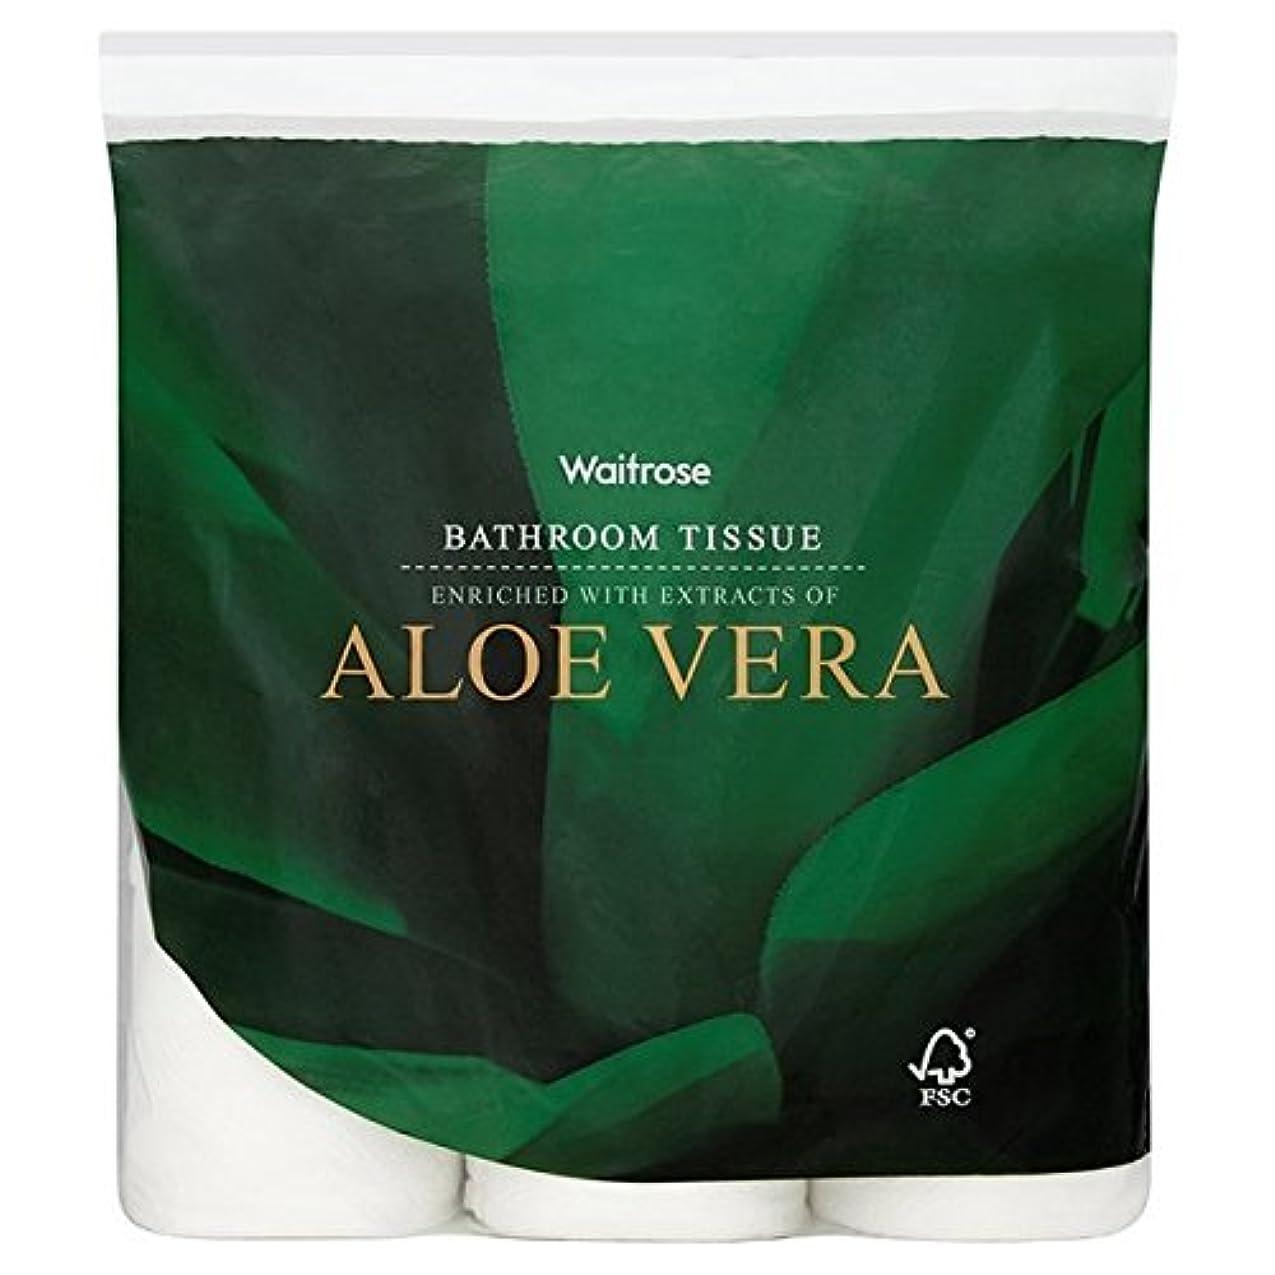 Aloe Vera Bathroom Tissue White Waitrose 9 per pack (Pack of 6) - パックあたりアロエベラ浴室組織白ウェイトローズ9 x6 [並行輸入品]